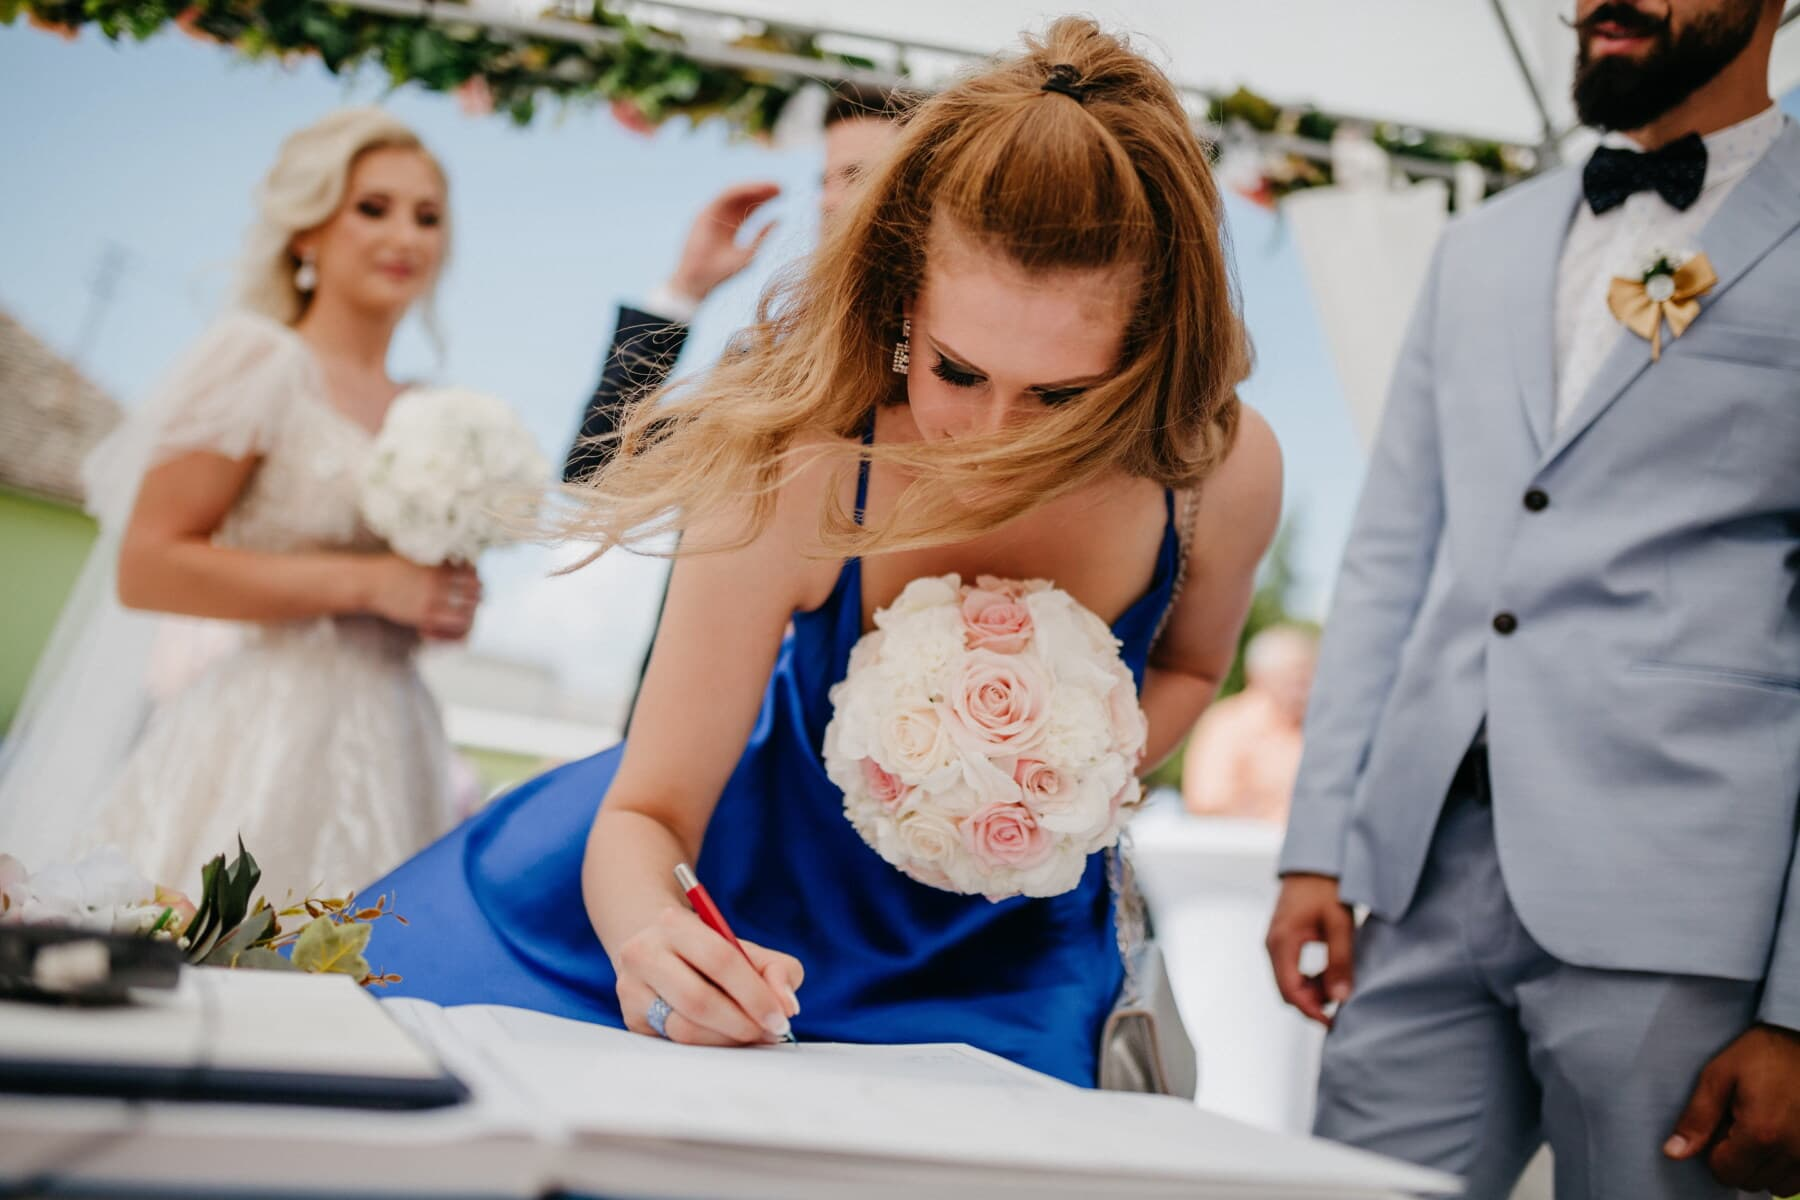 sign, marriage, godfather, friends, friendship, bride, groom, wedding, man, people